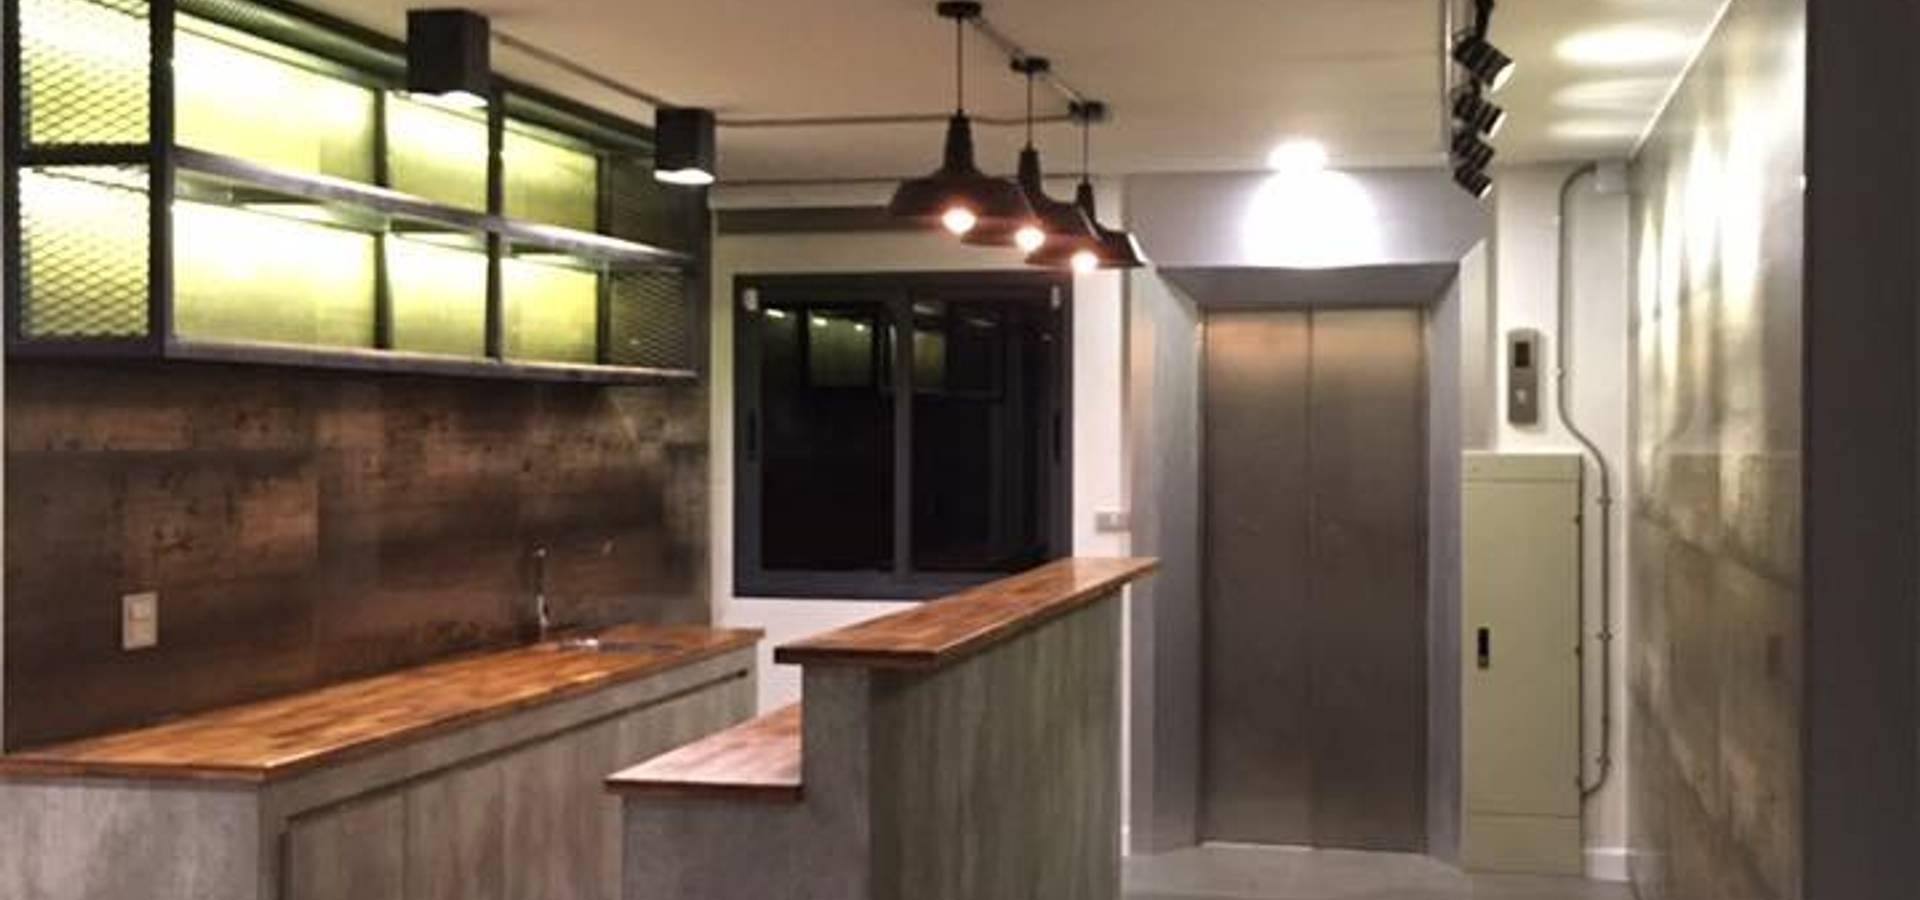 Design Corner (Thailand) Co,Ltd